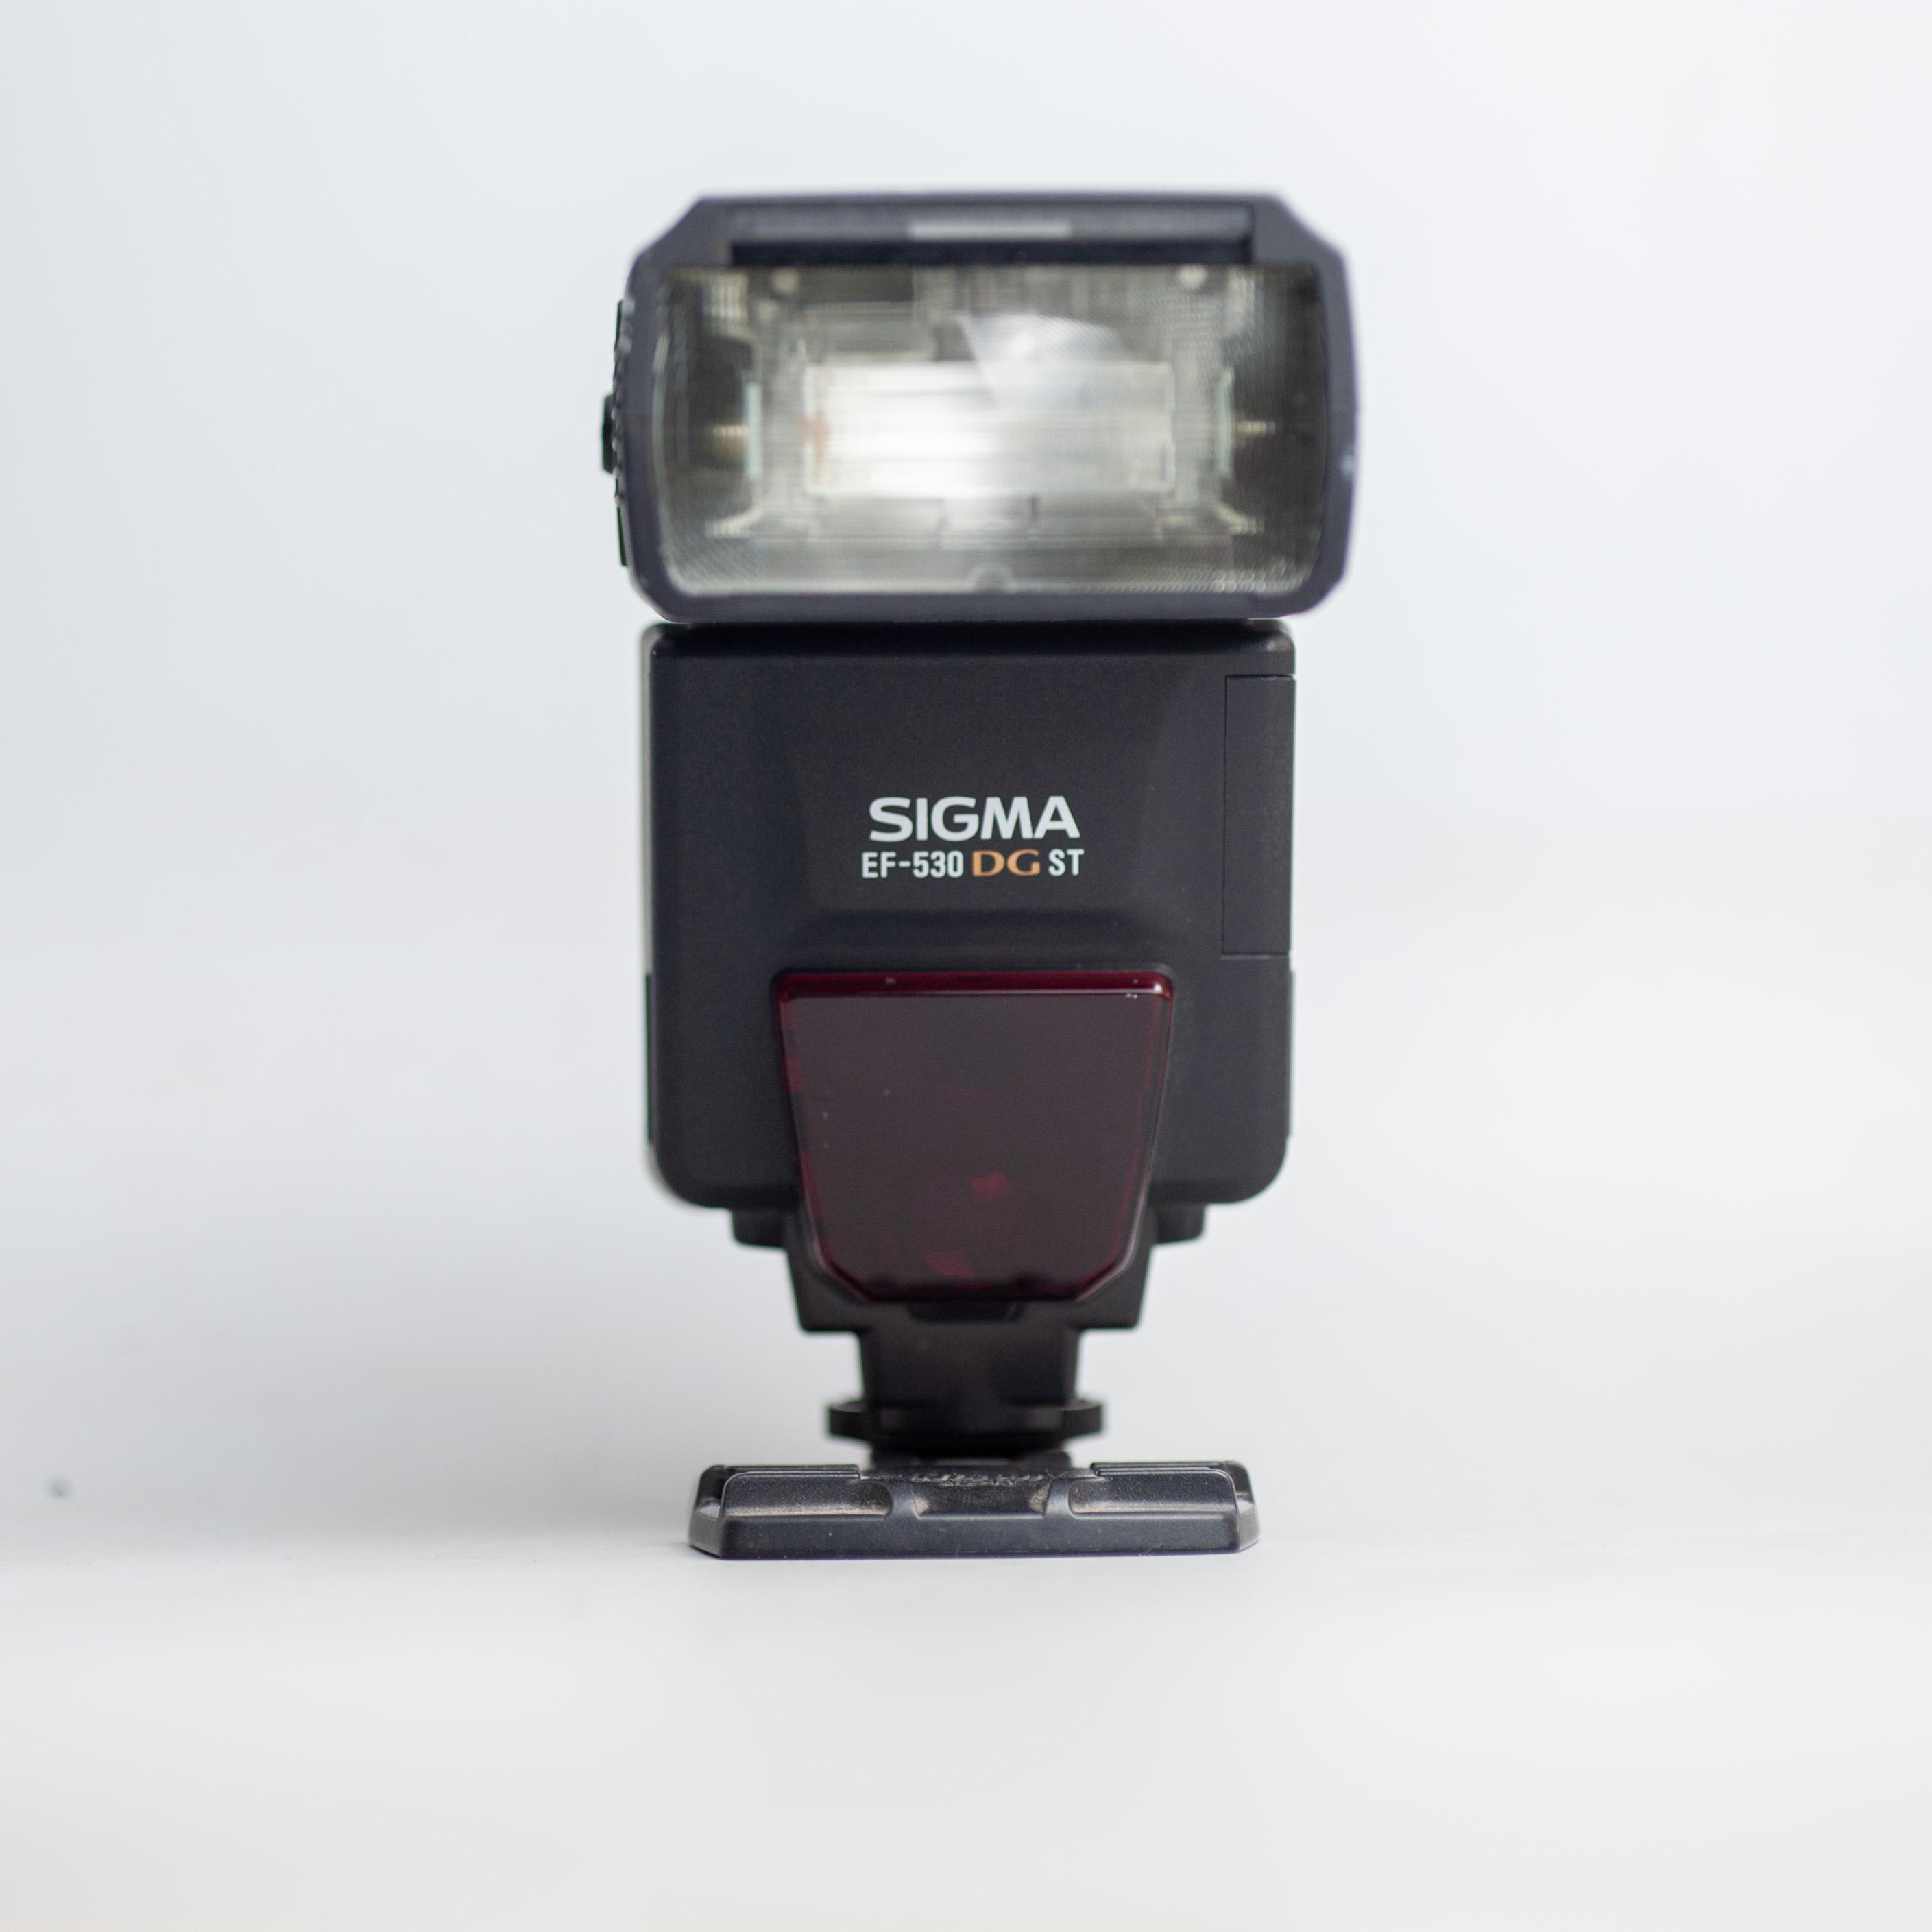 sigma-ef-530-dg-st-canon-flash-sigma-530-12410